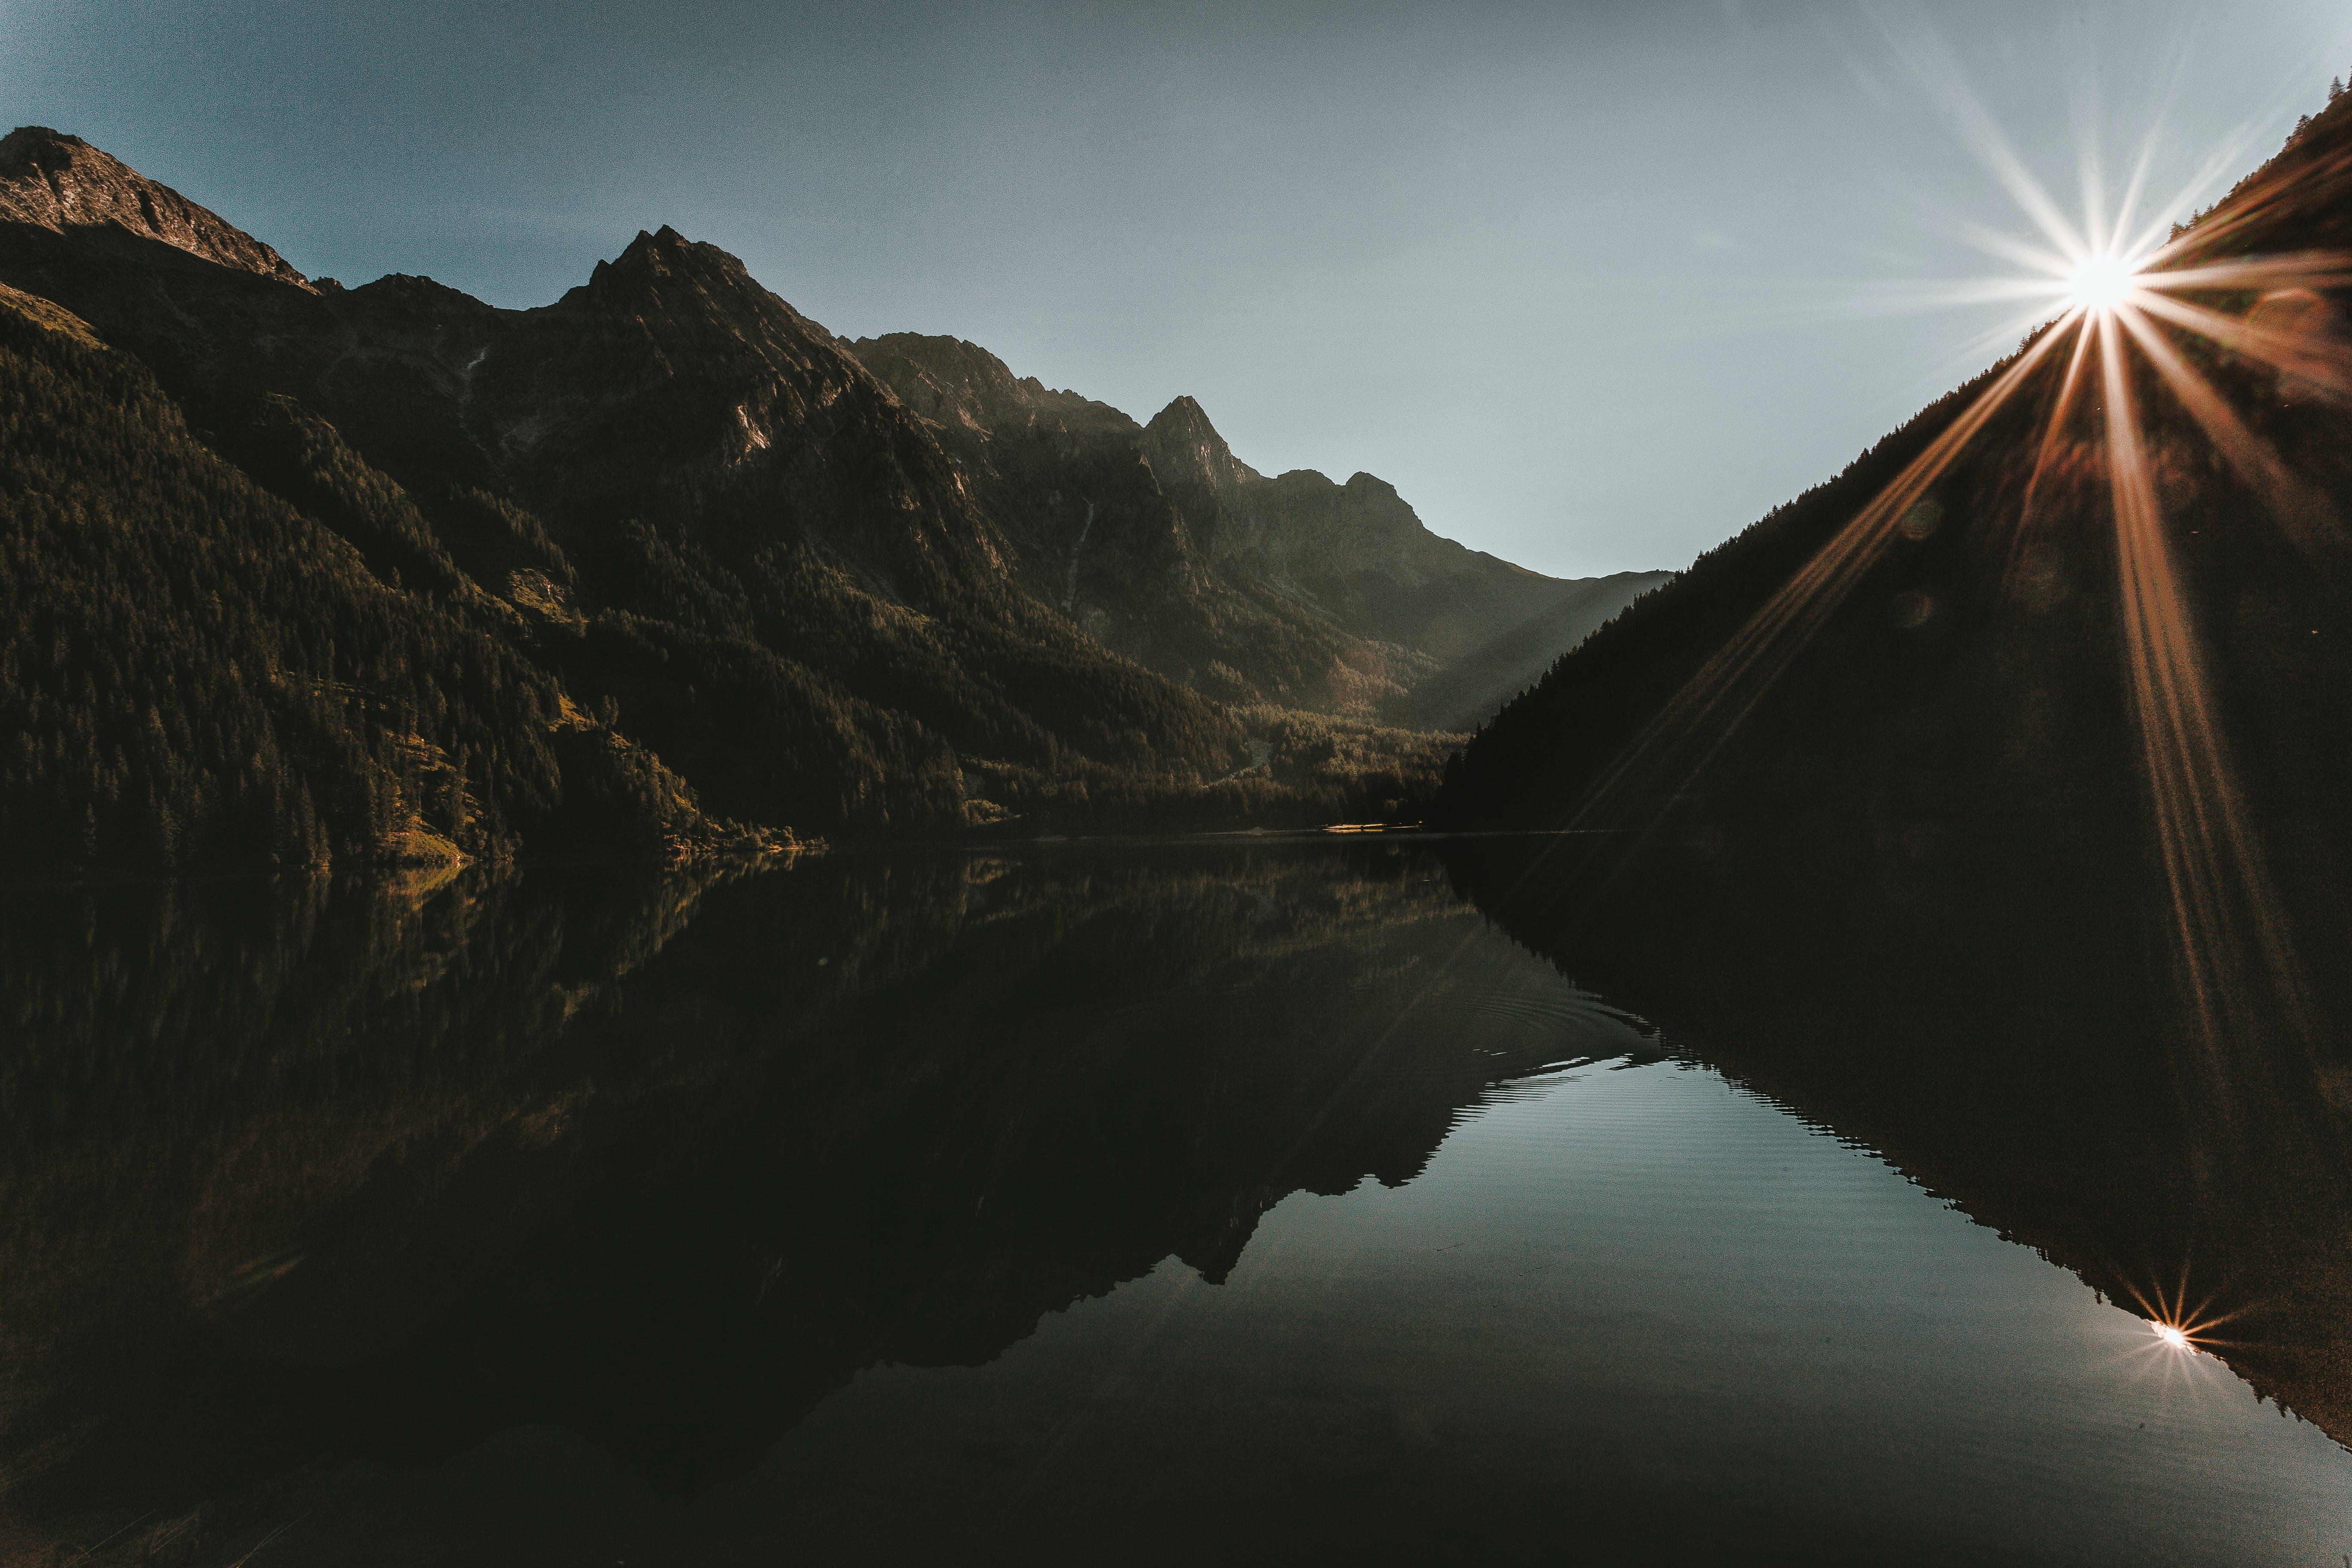 Landscape Photo of Mountains Under Gray Sky